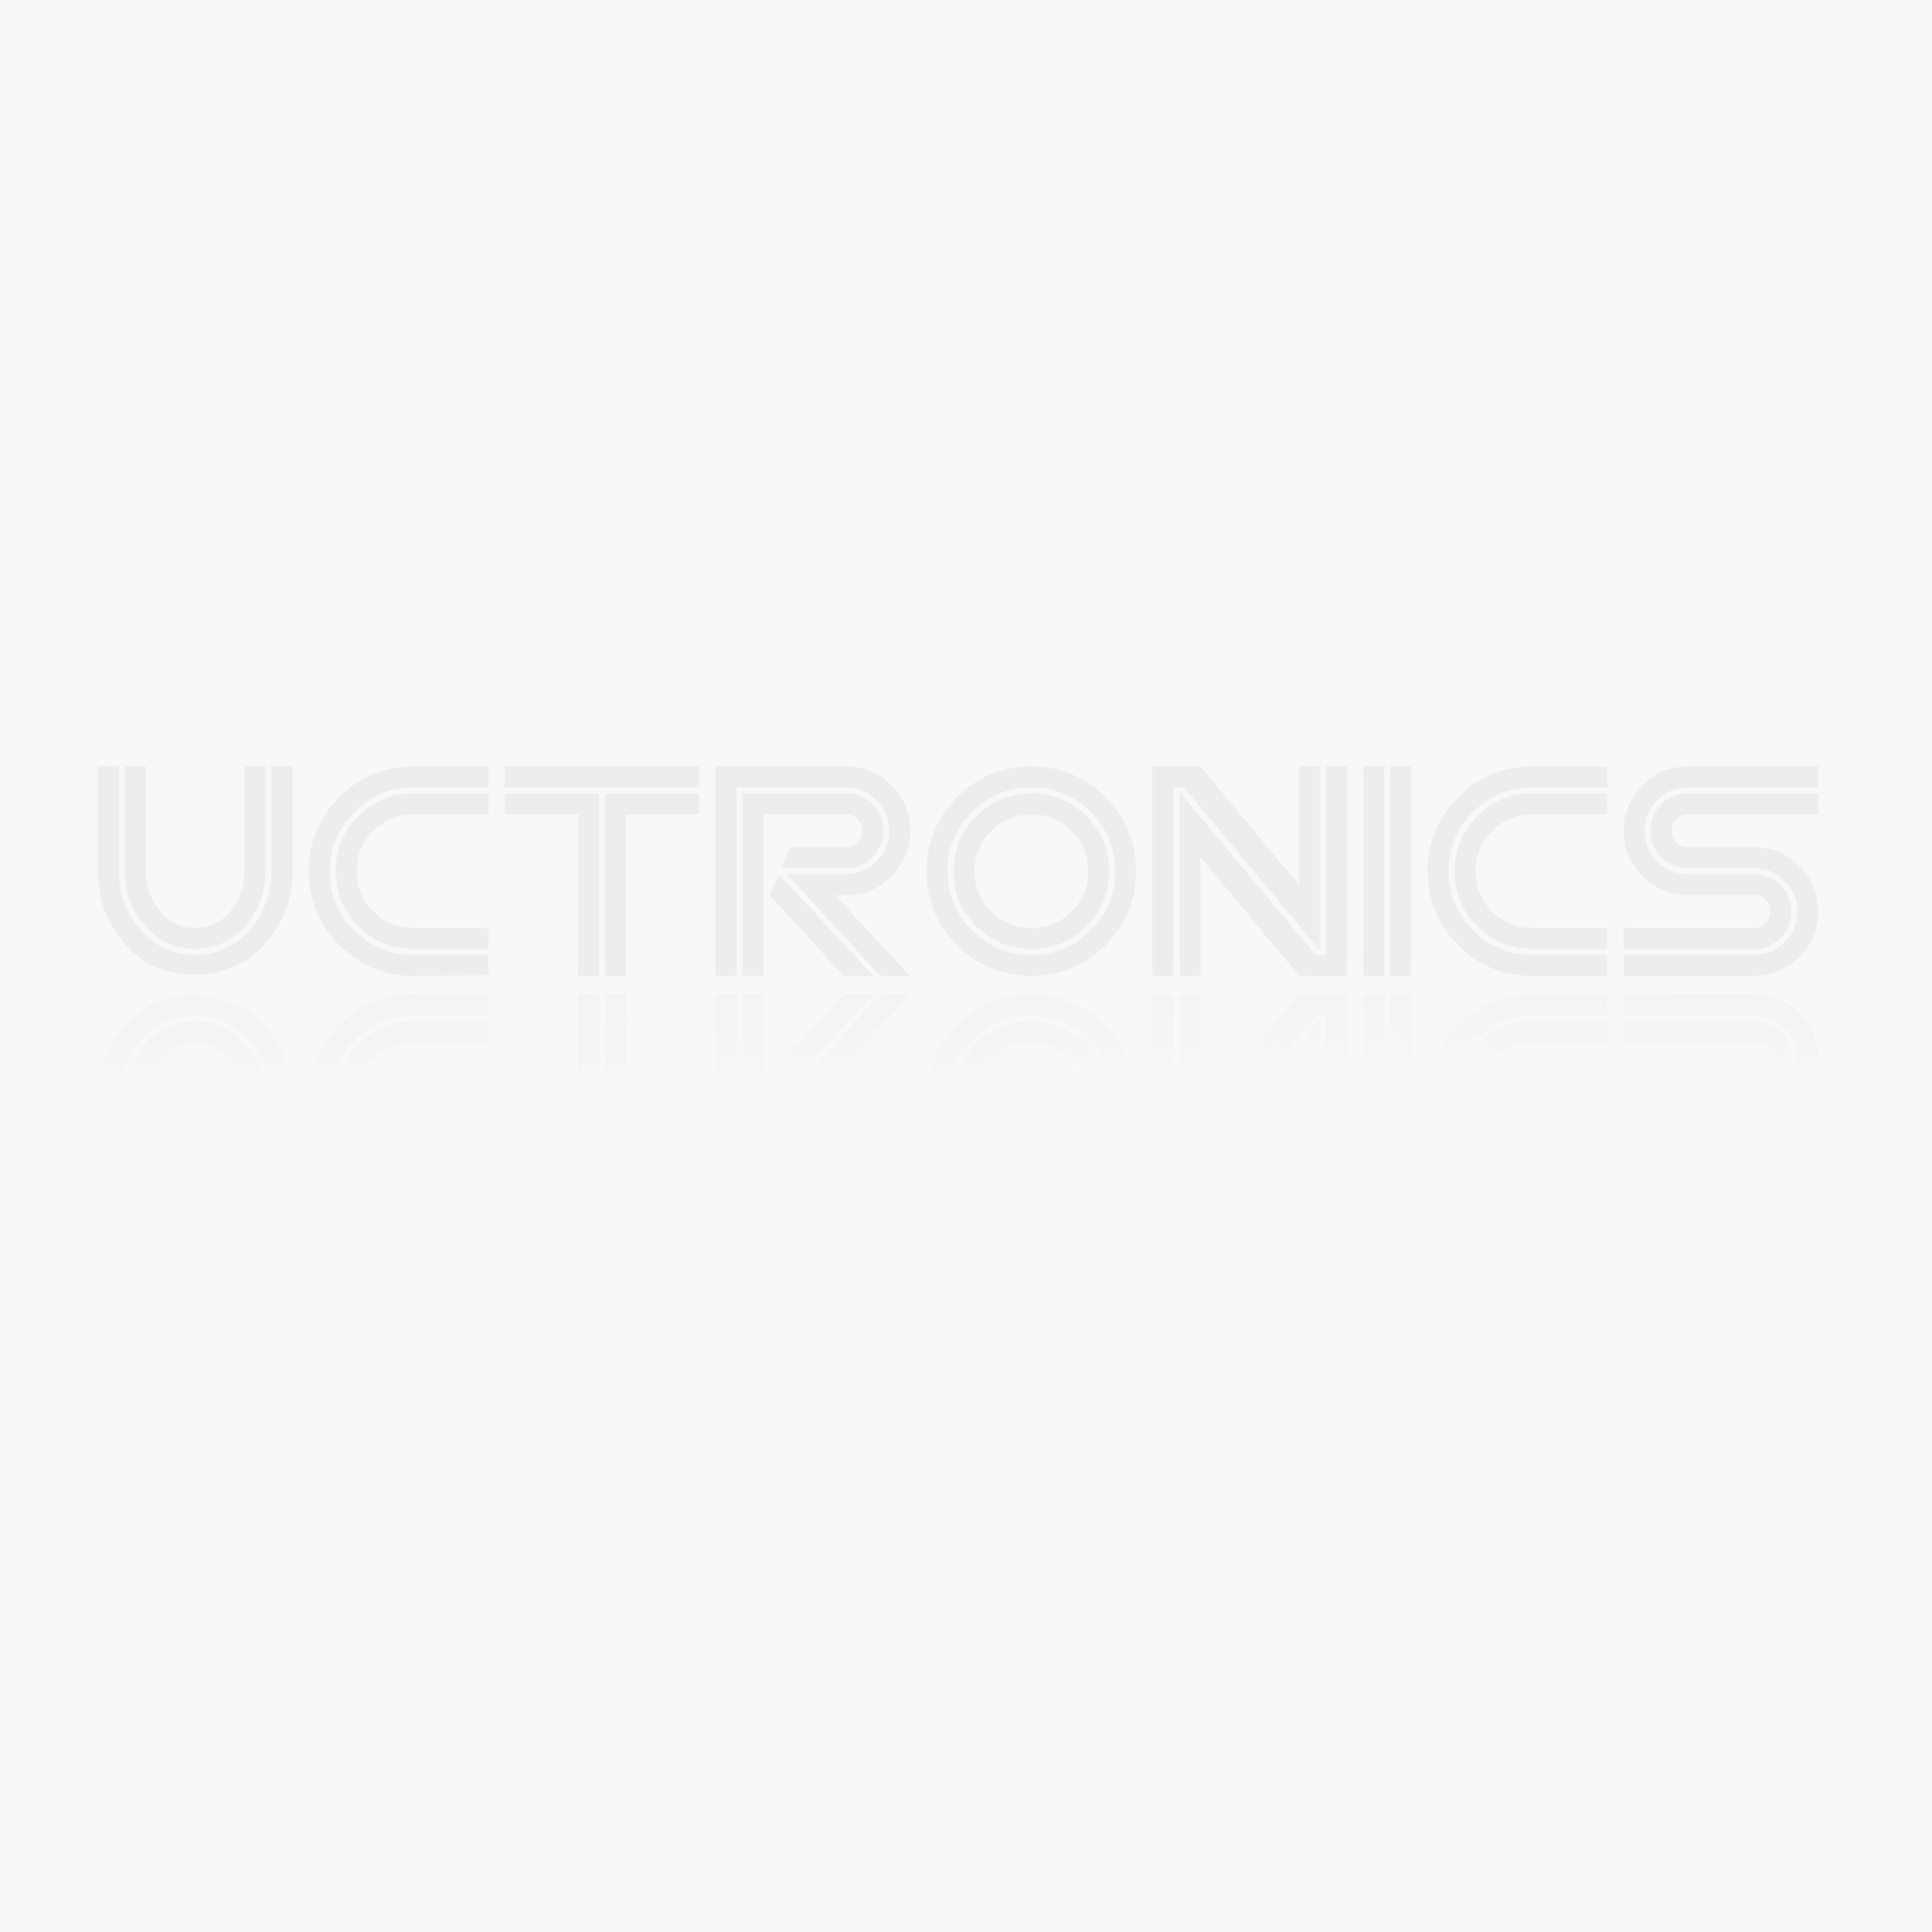 GY-61 ADXL335 3-axis Analog Output Accelerometer Module angular sensor